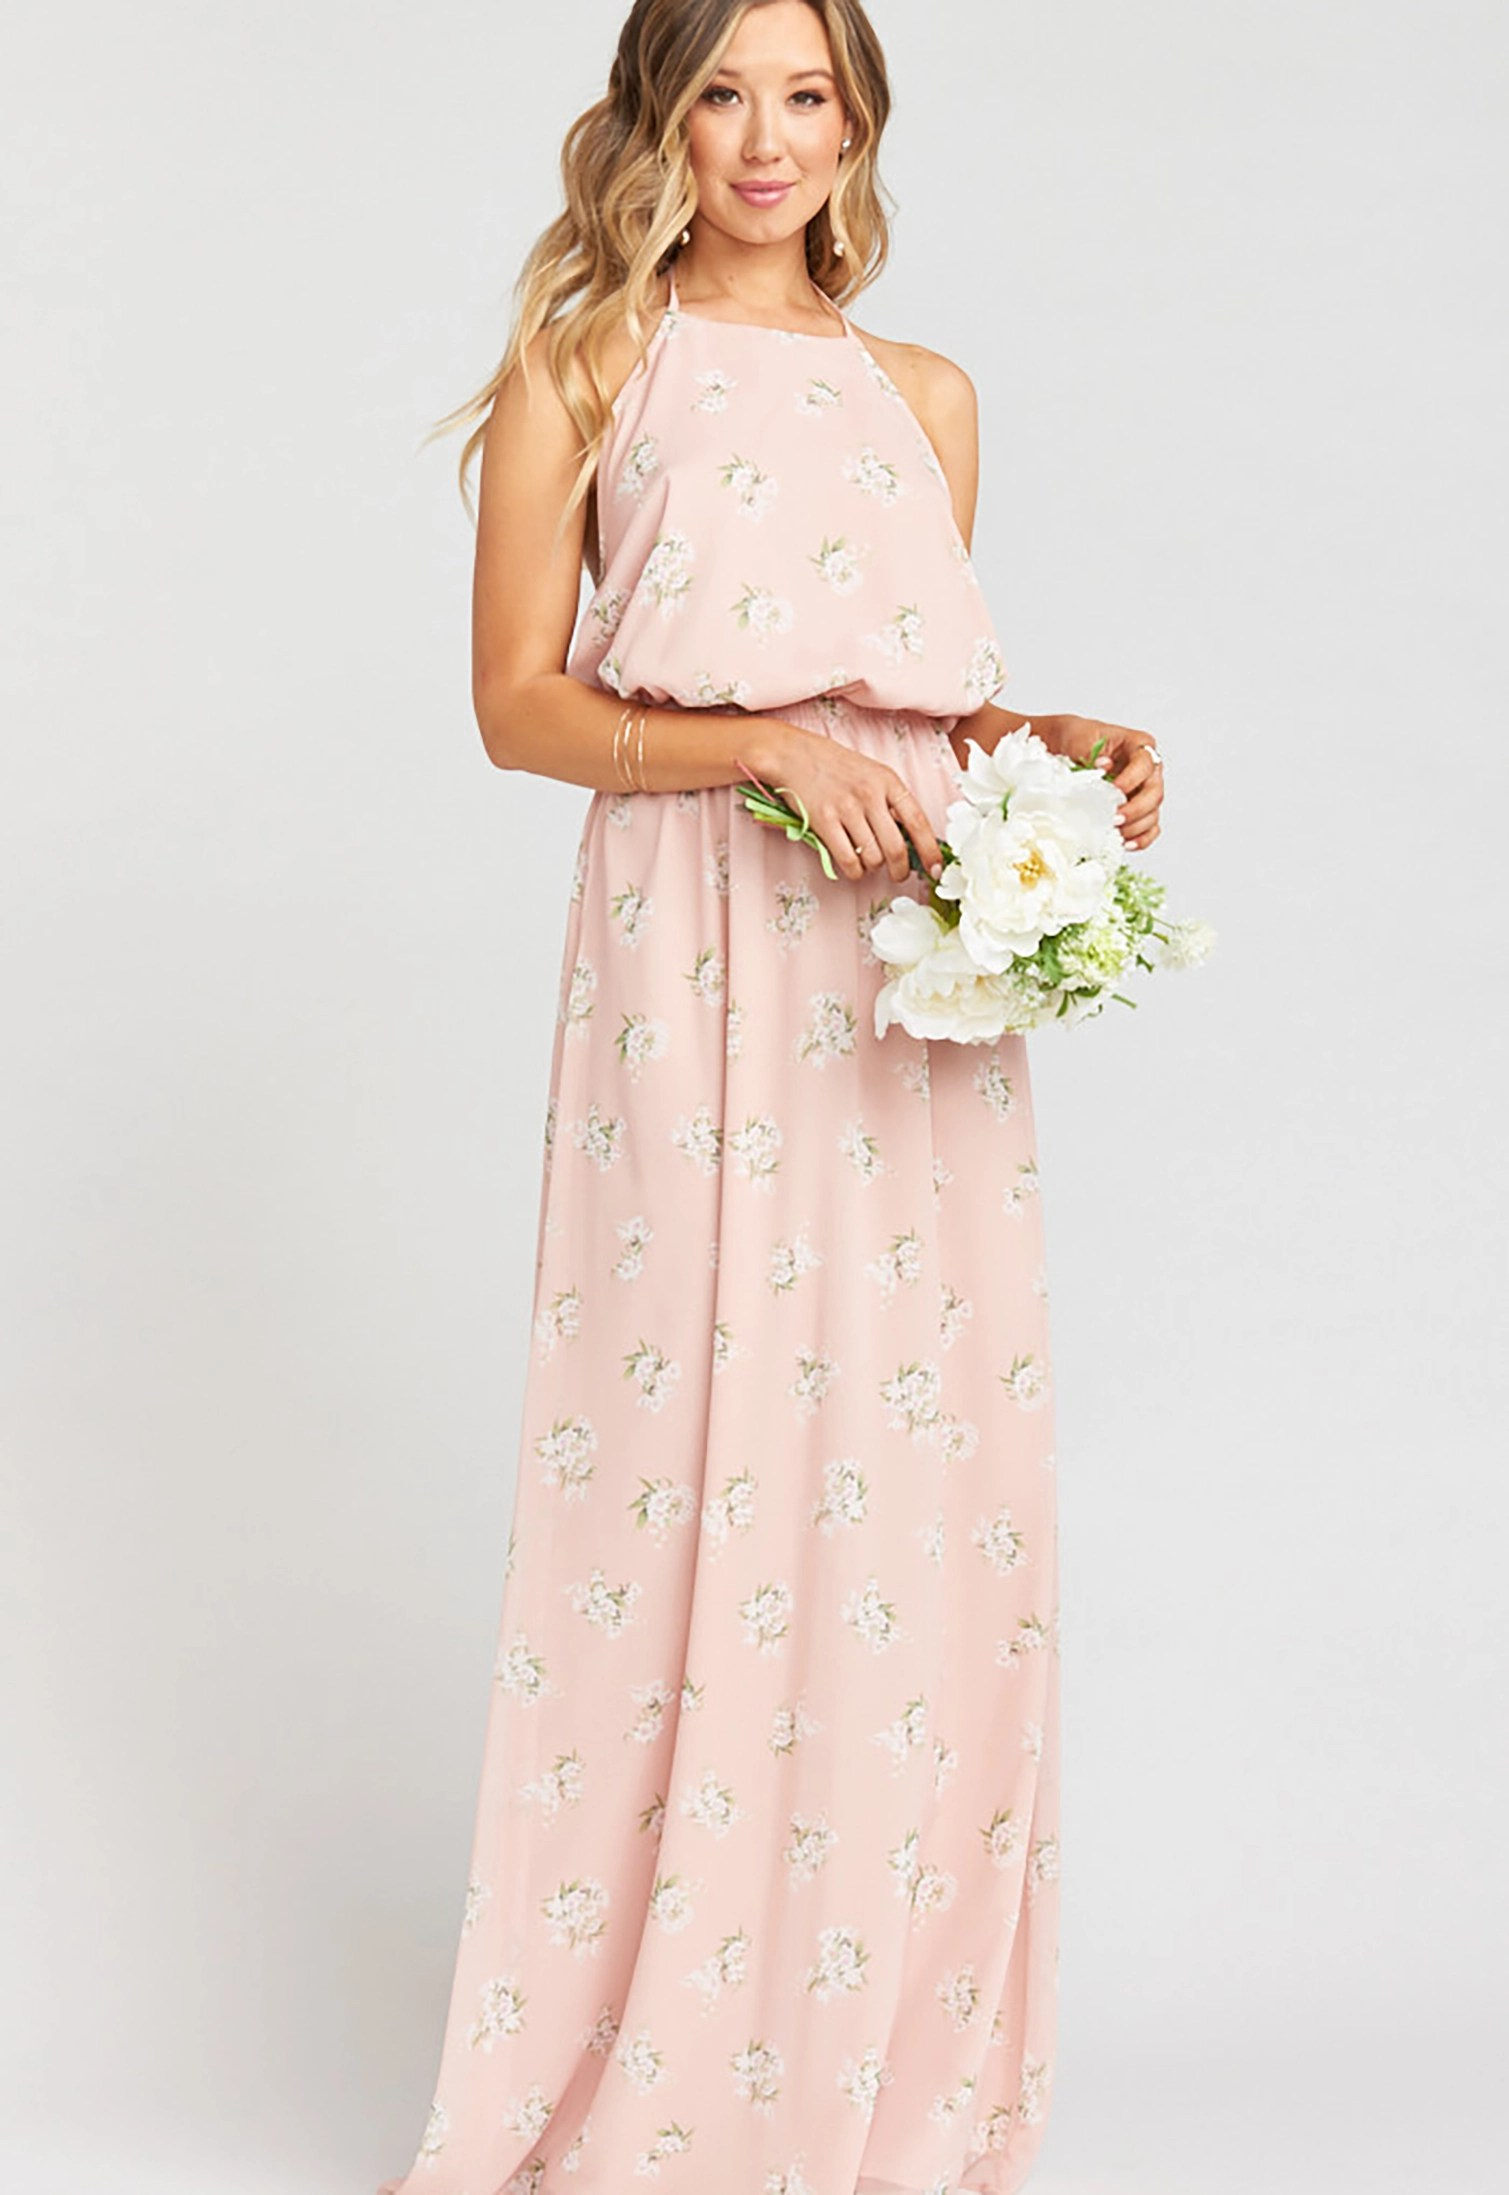 Blush GWSxMumu Bridesmaid Dress